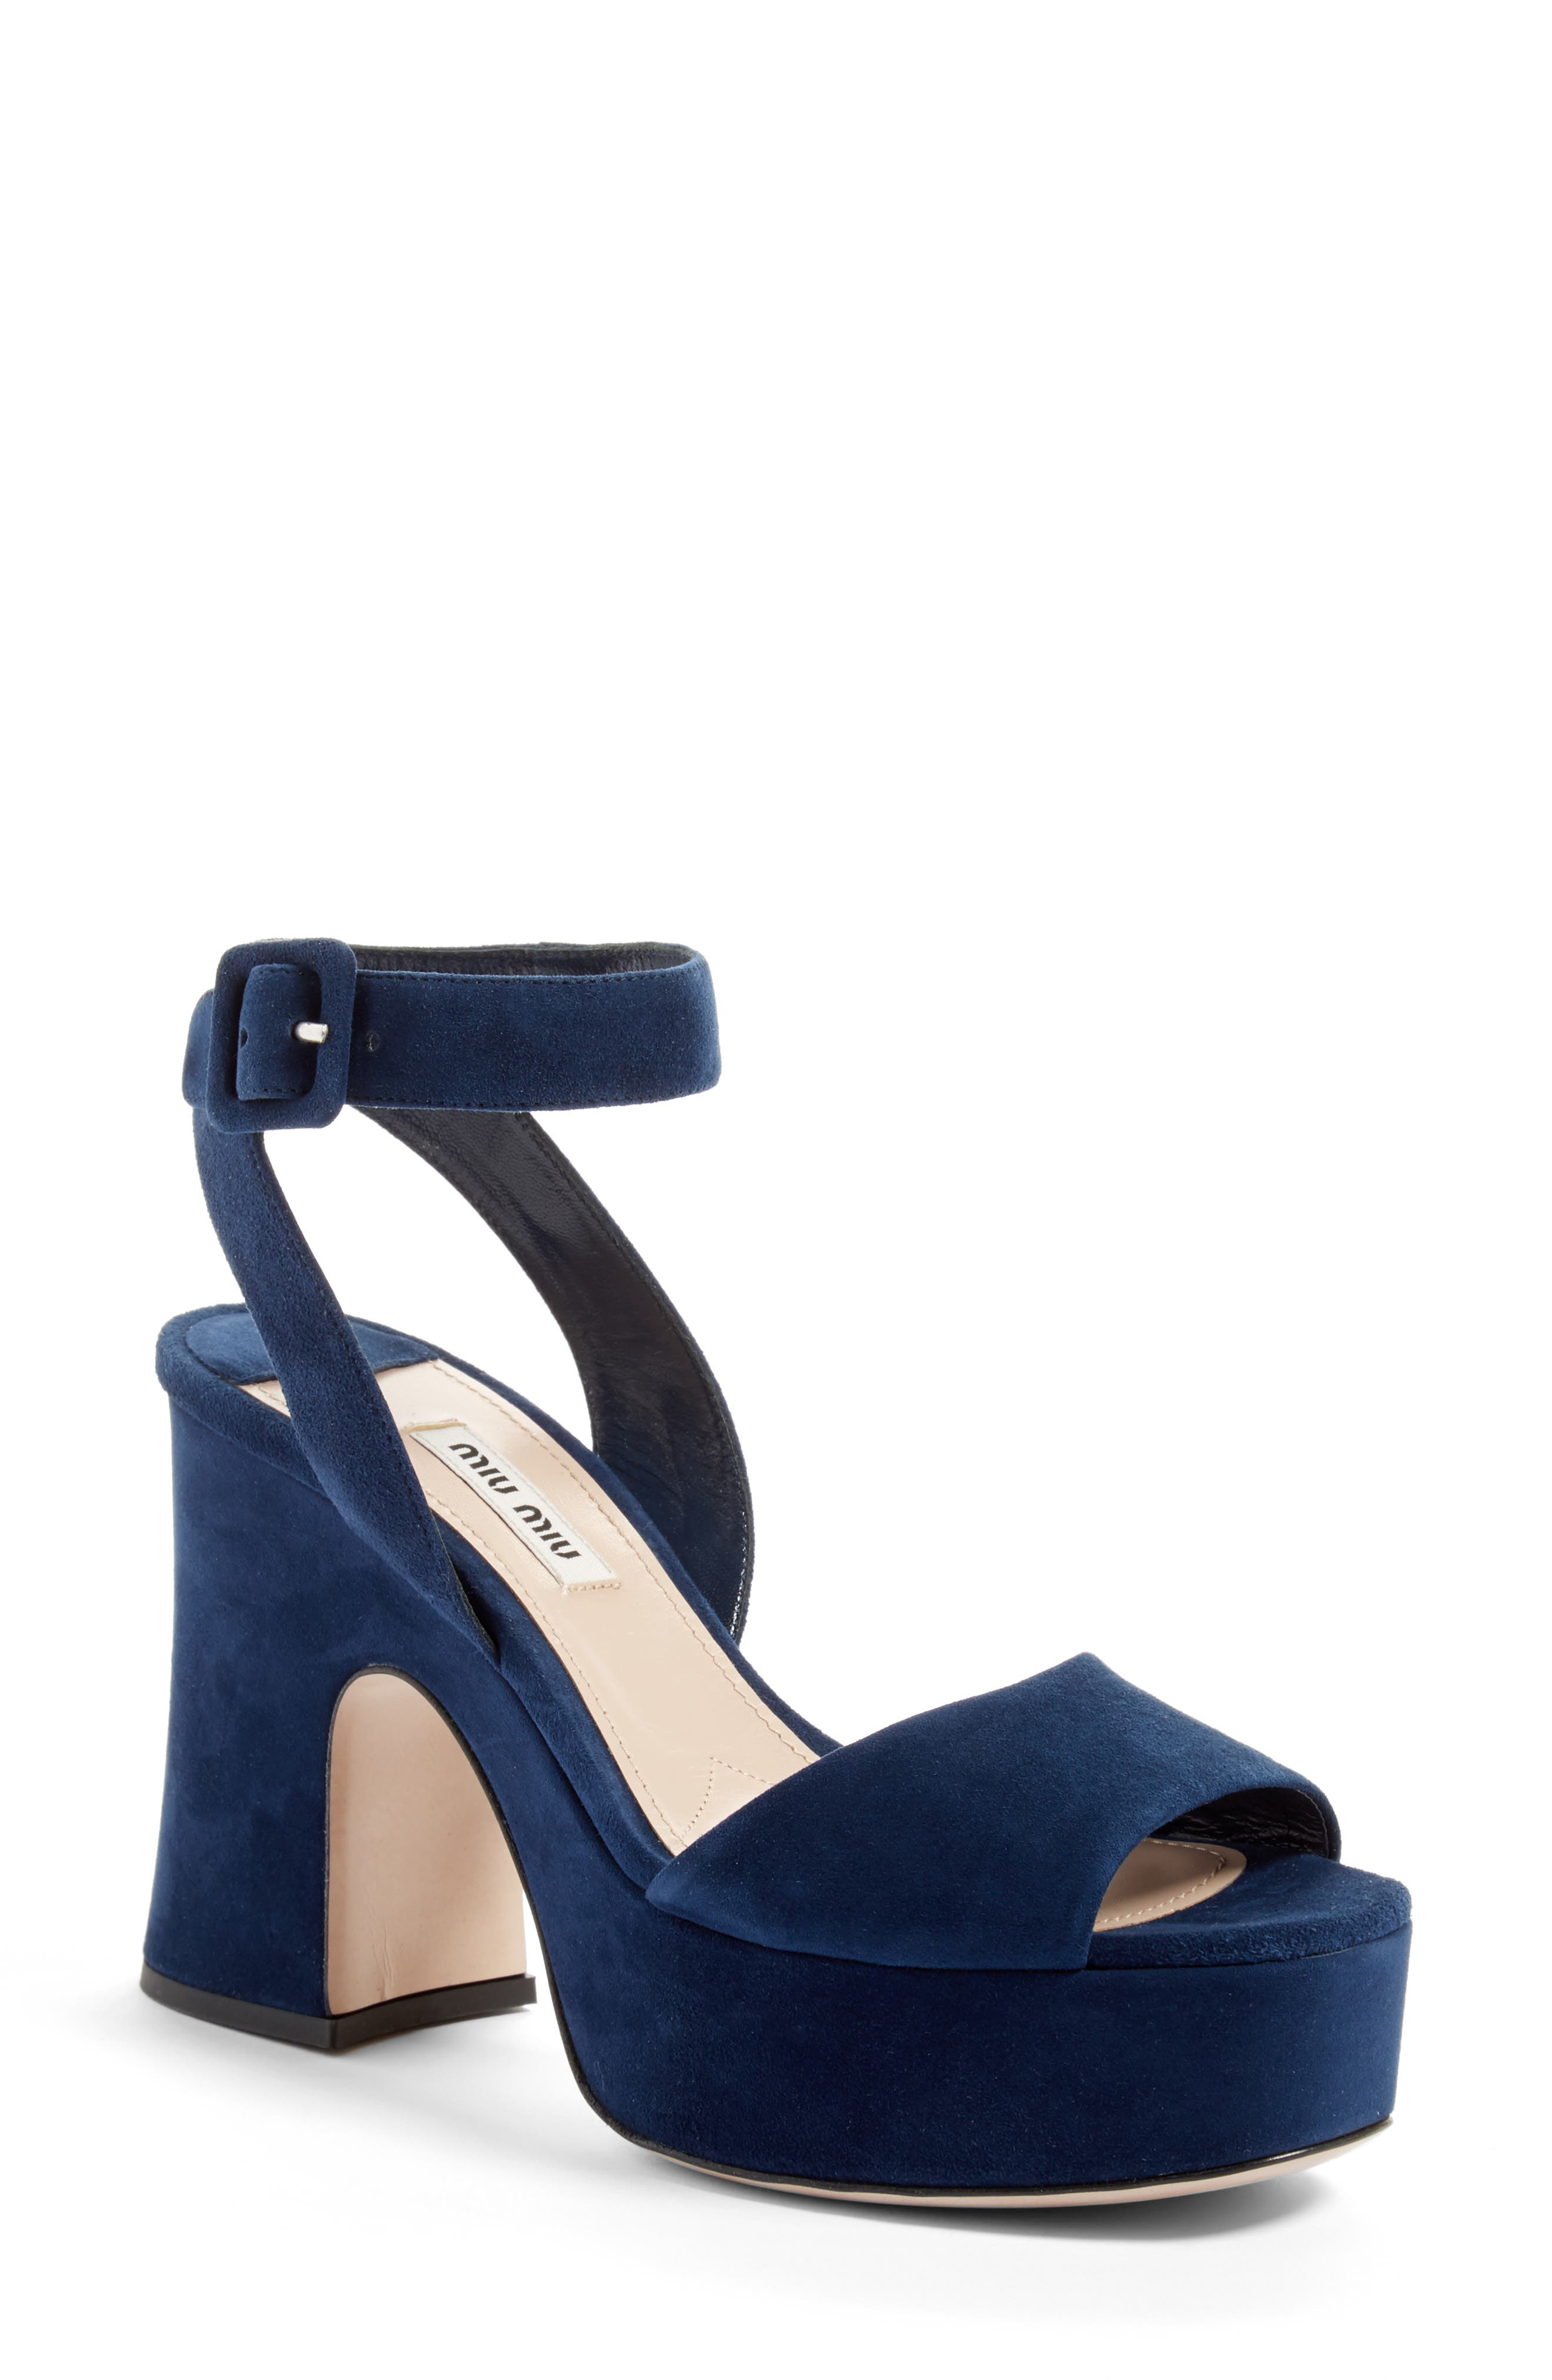 Main Image - Miu Miu Platform Strap Sandal (Women)